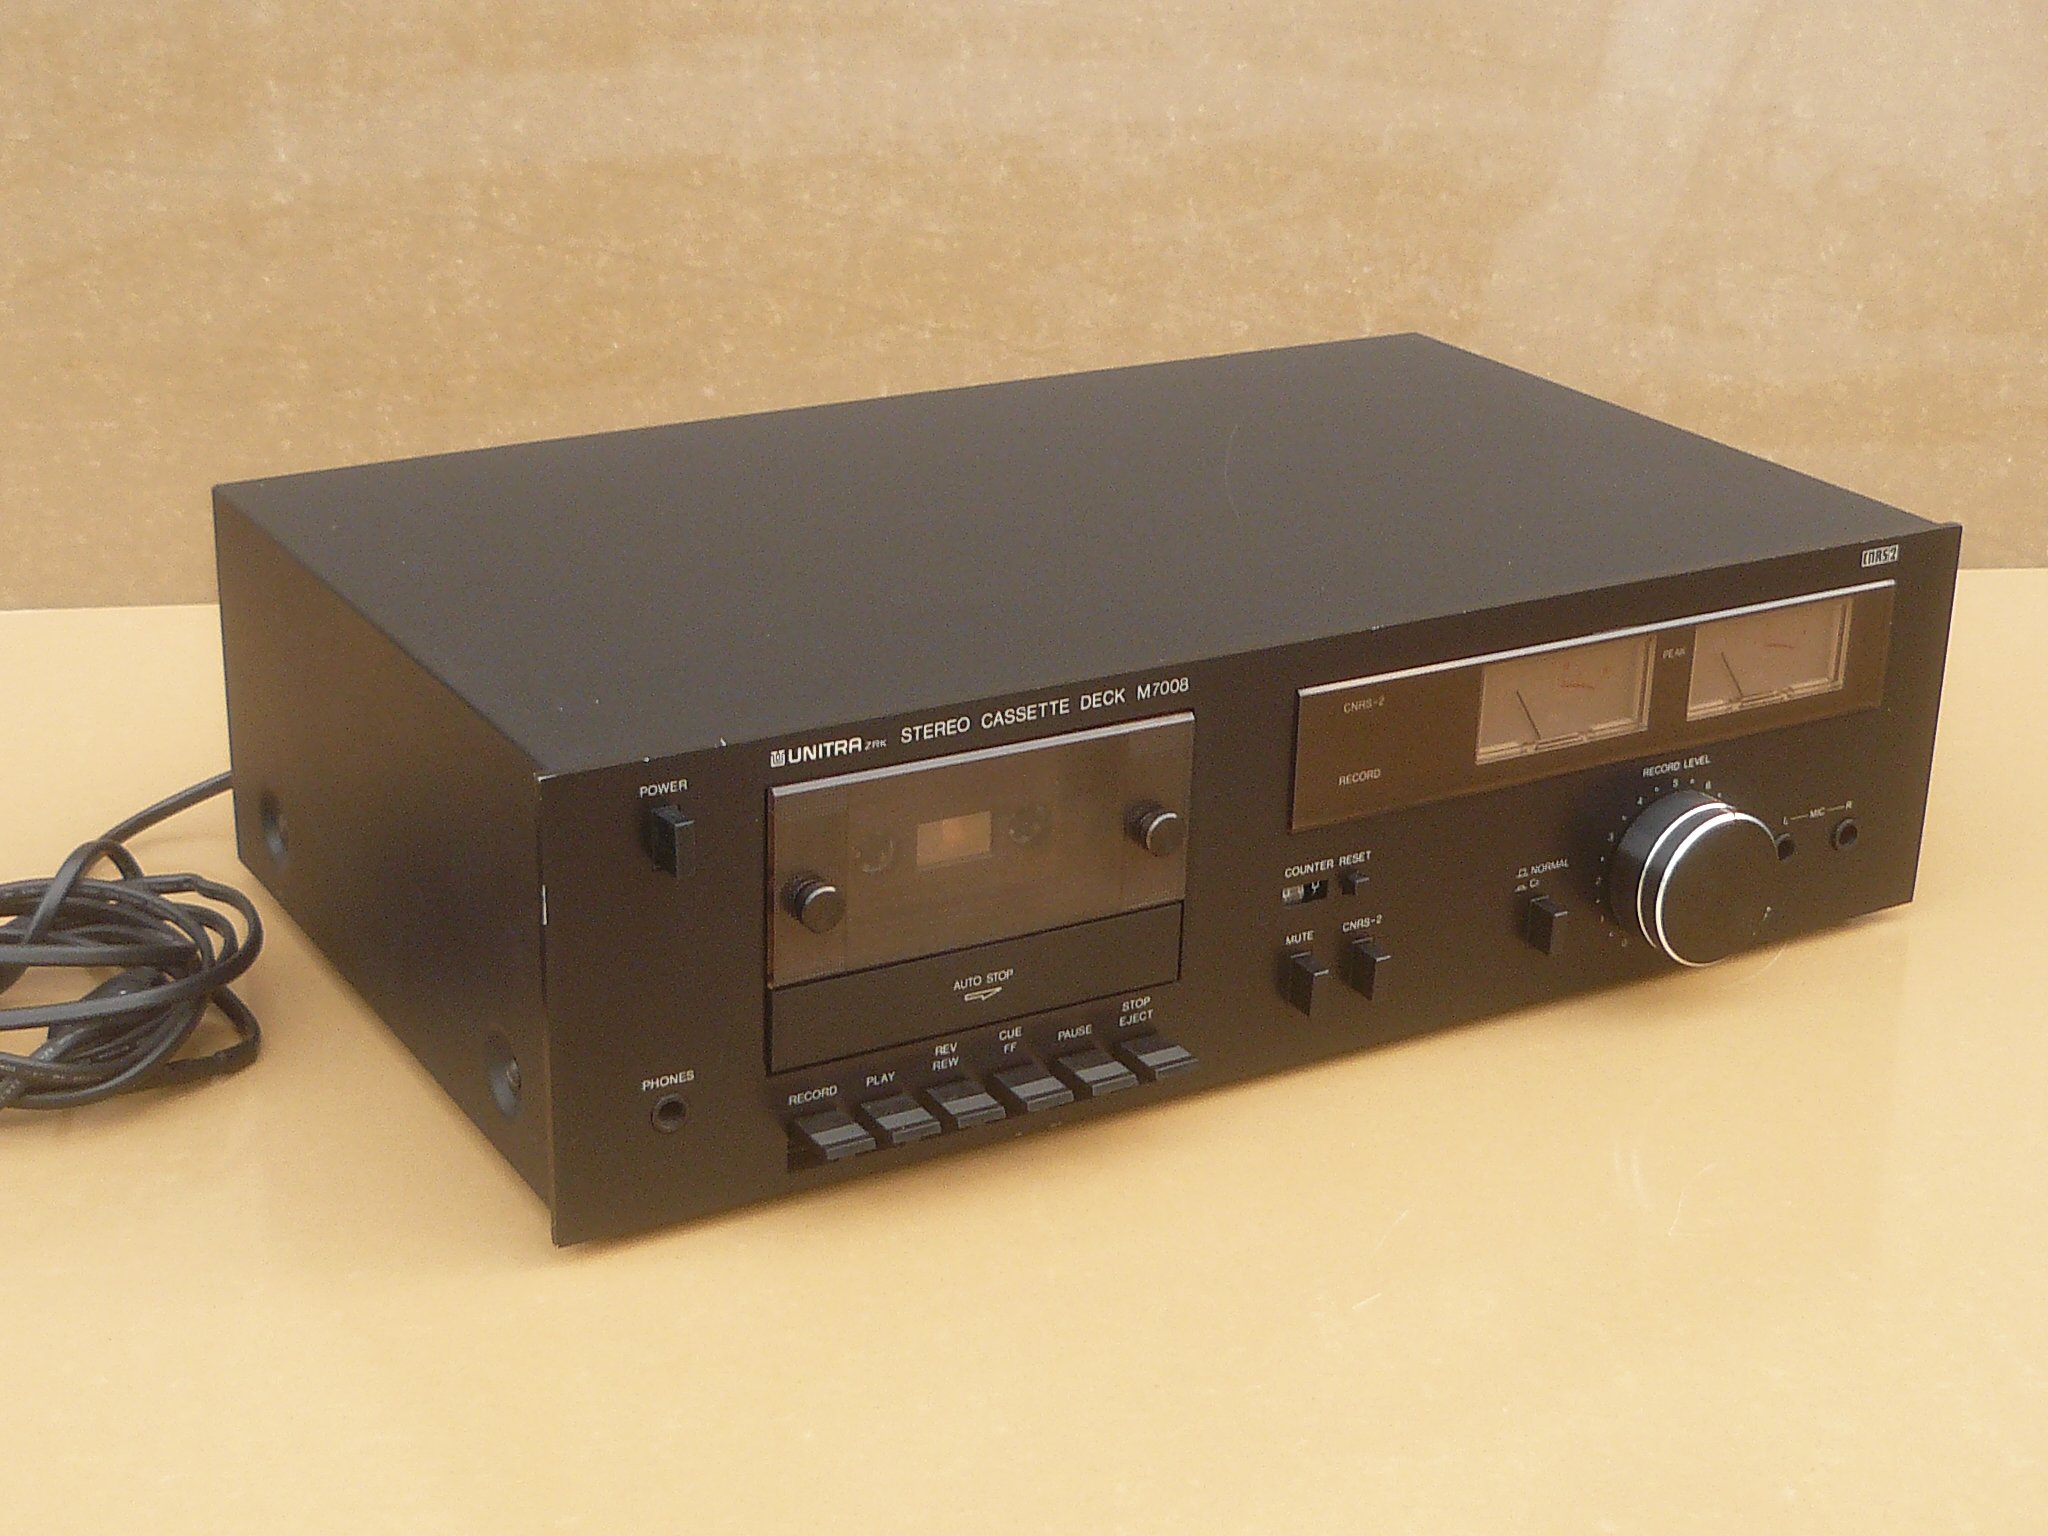 Magnetofon Unitra ZRK stereo Cassette deck m7008